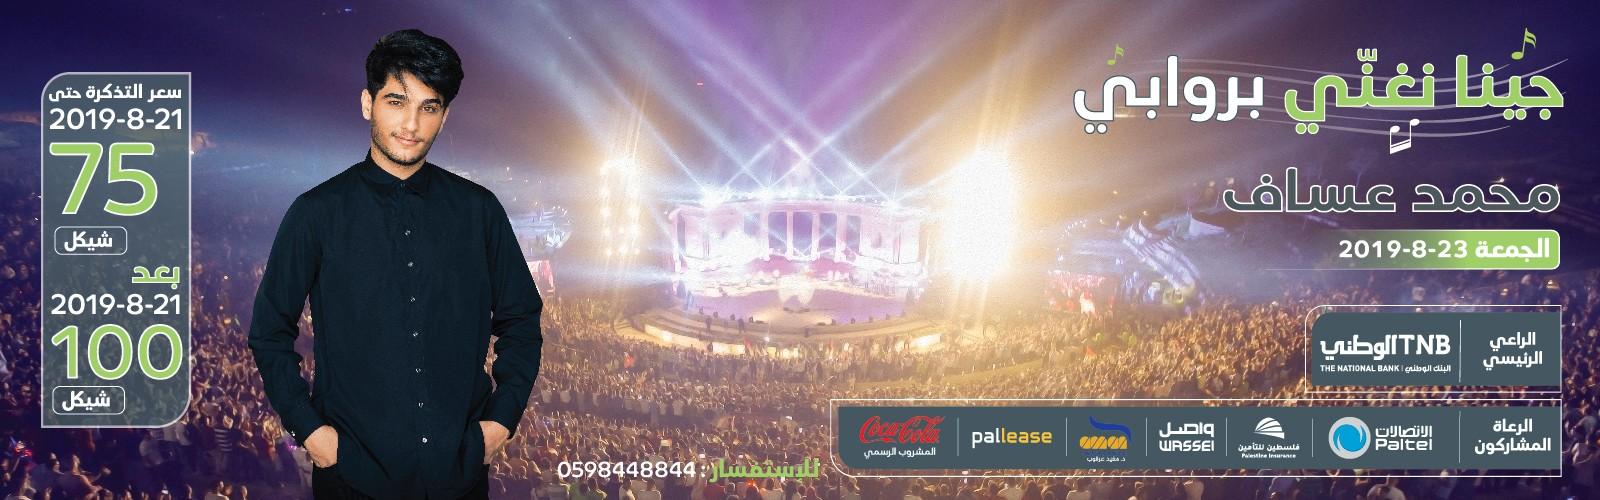 Mohammed Assaf in Rawabi